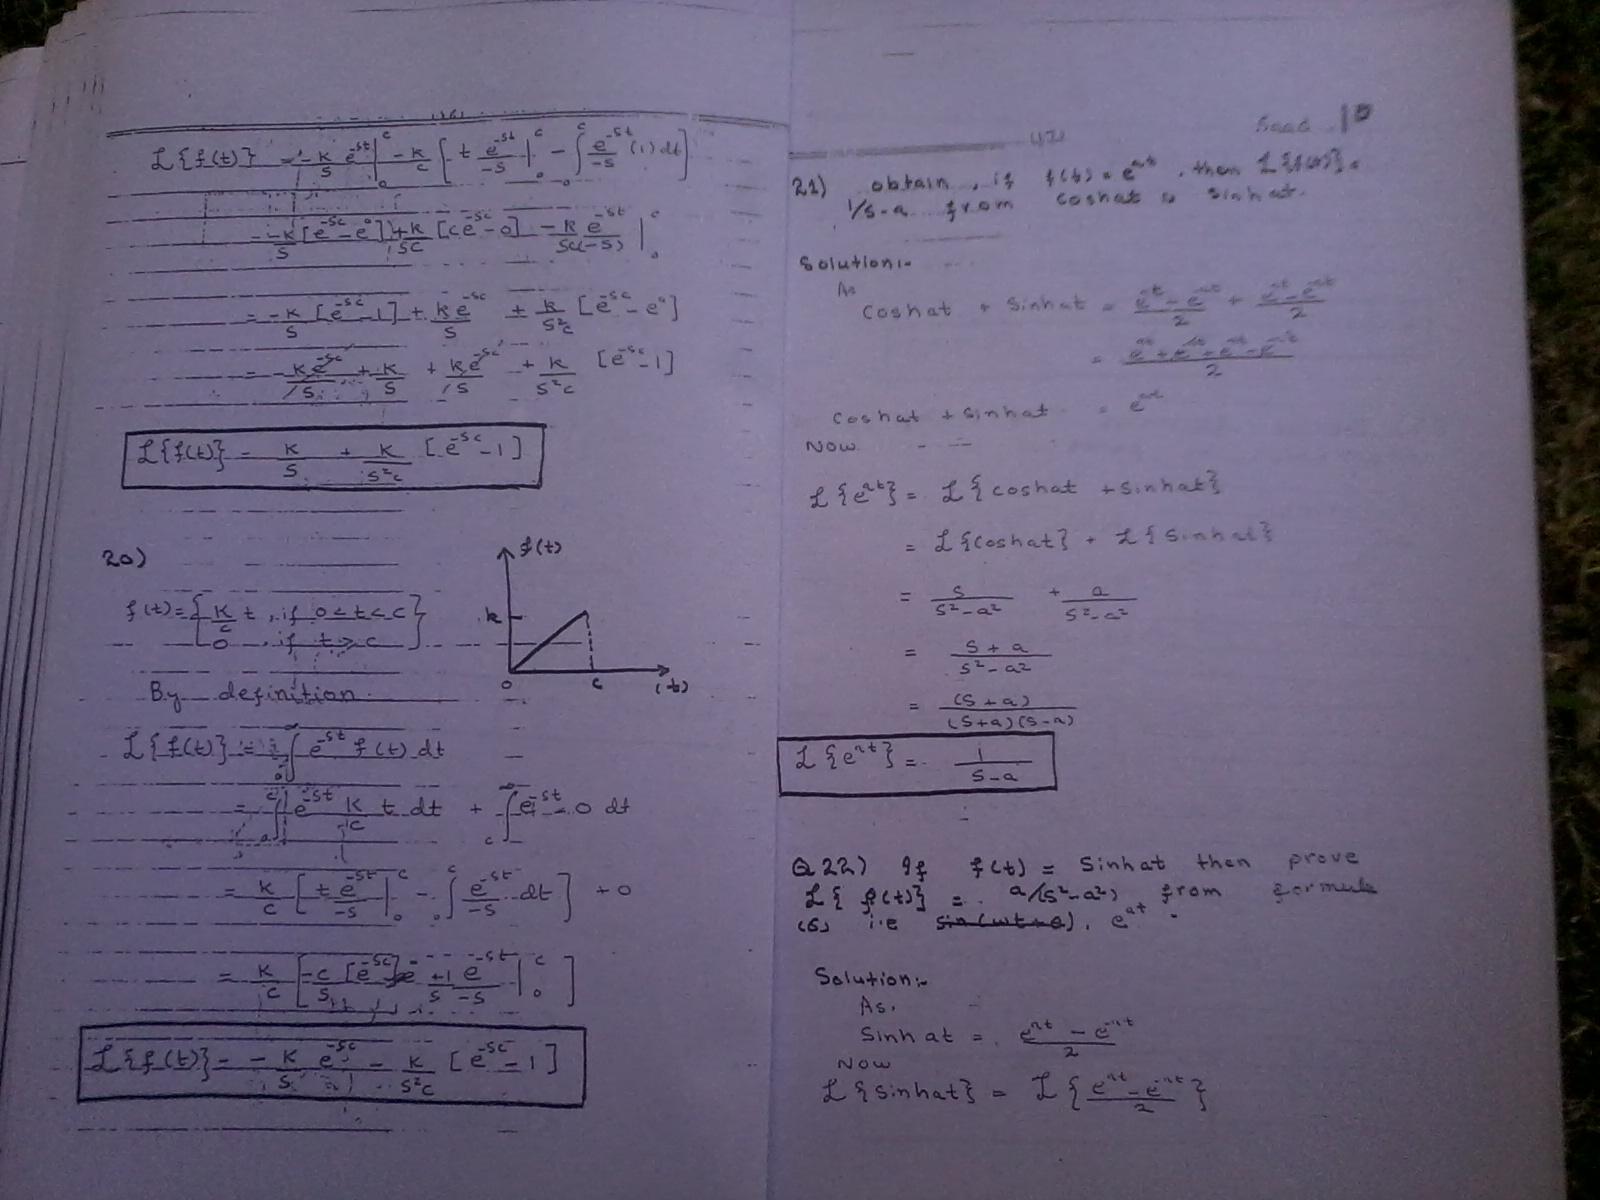 Erwin Kreyszig Advanced Engineering Mathematics documents